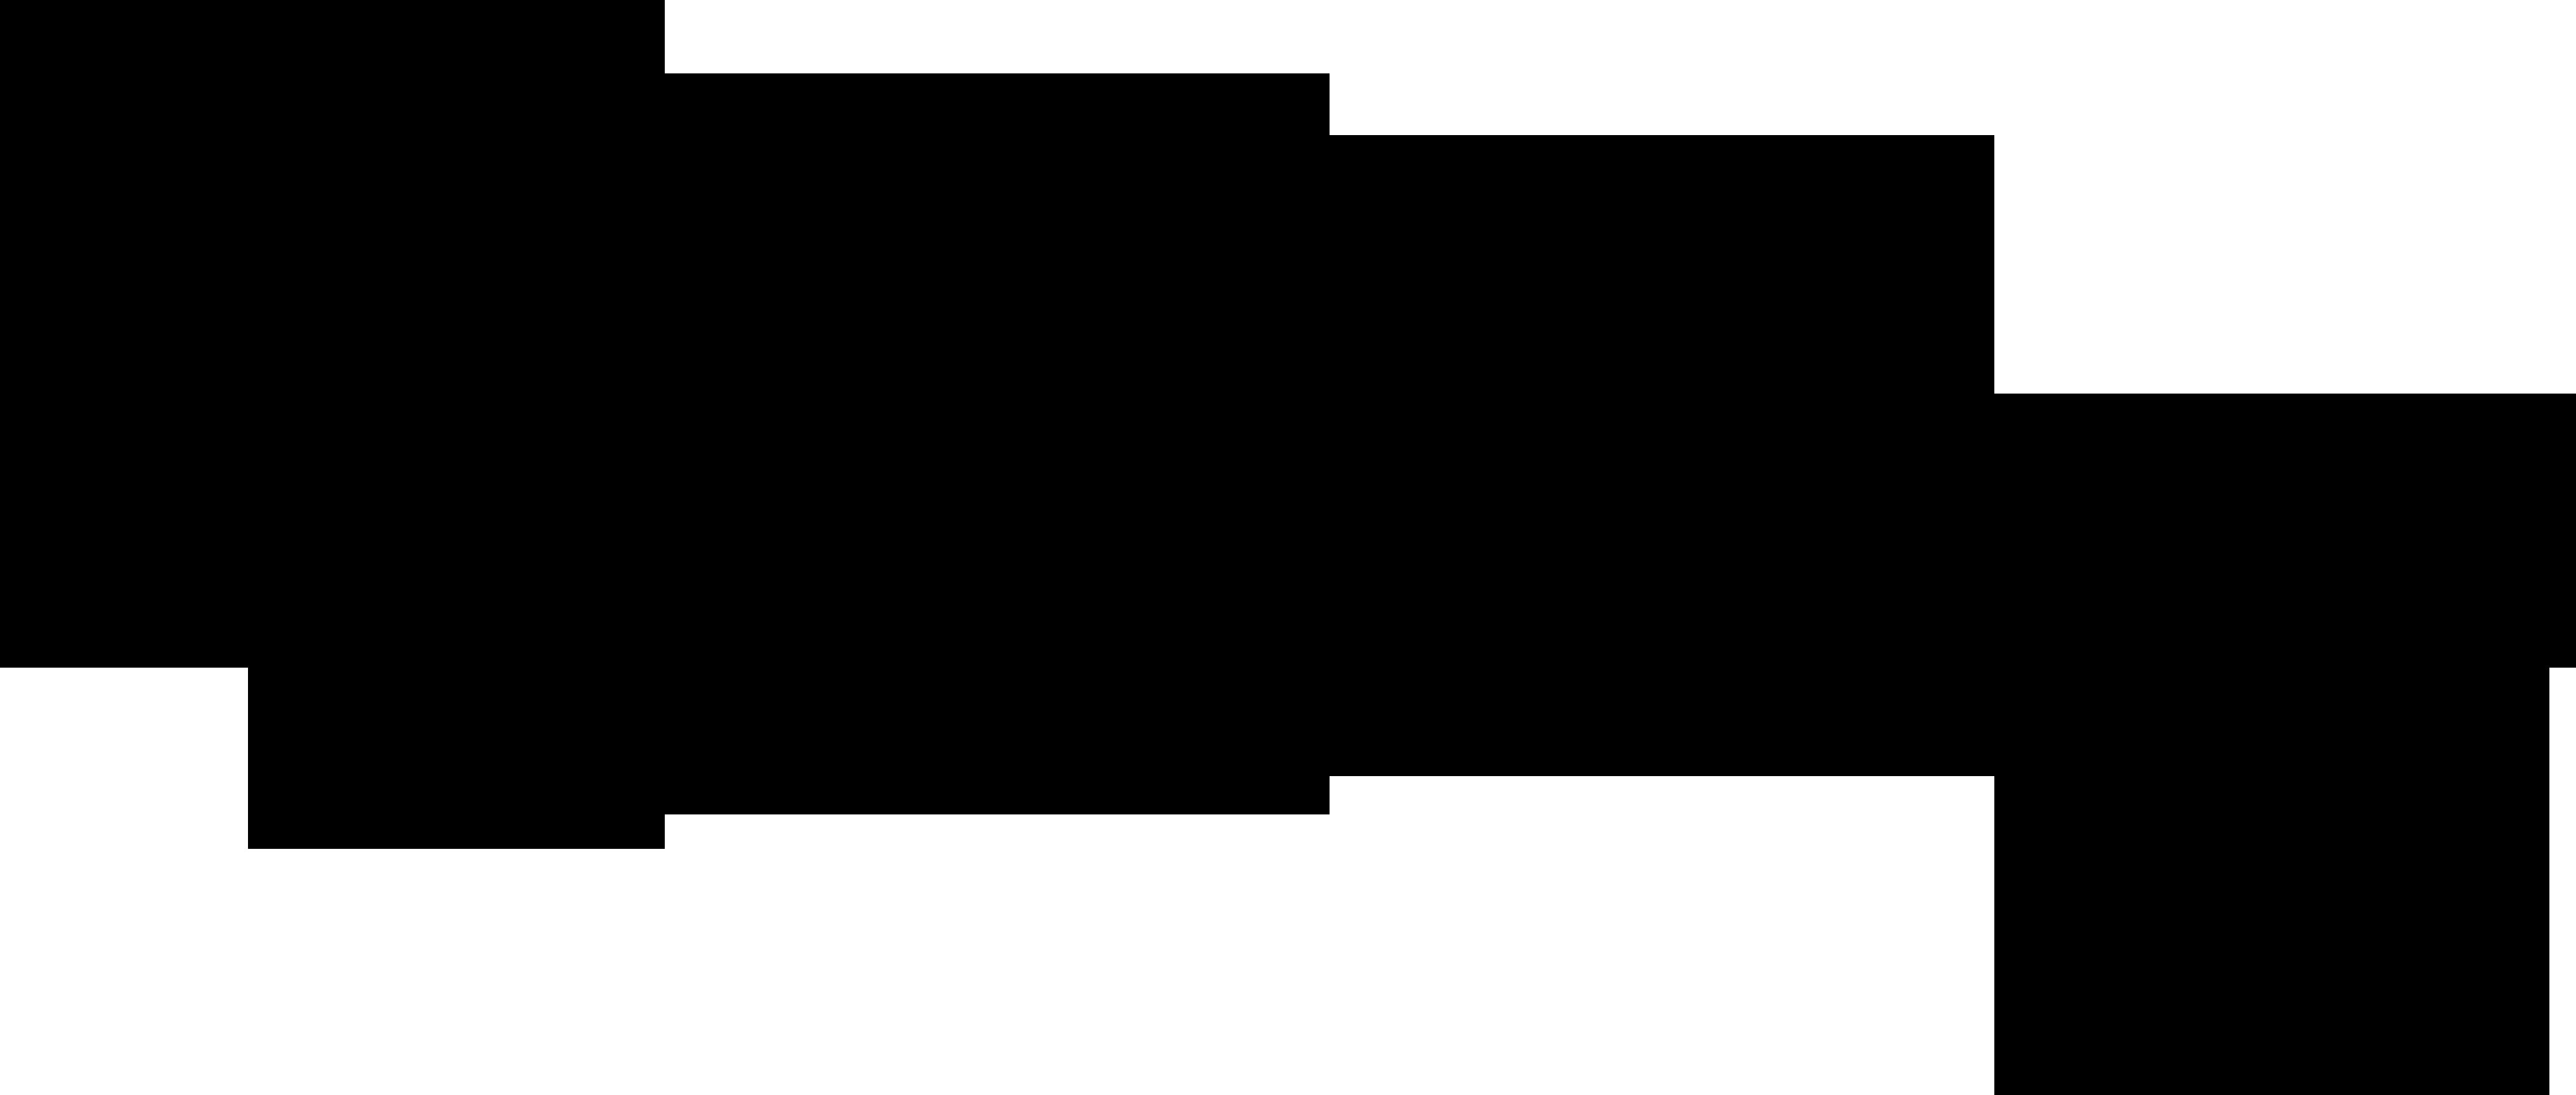 Disney Logo Transparent images Disney logo, Disney font